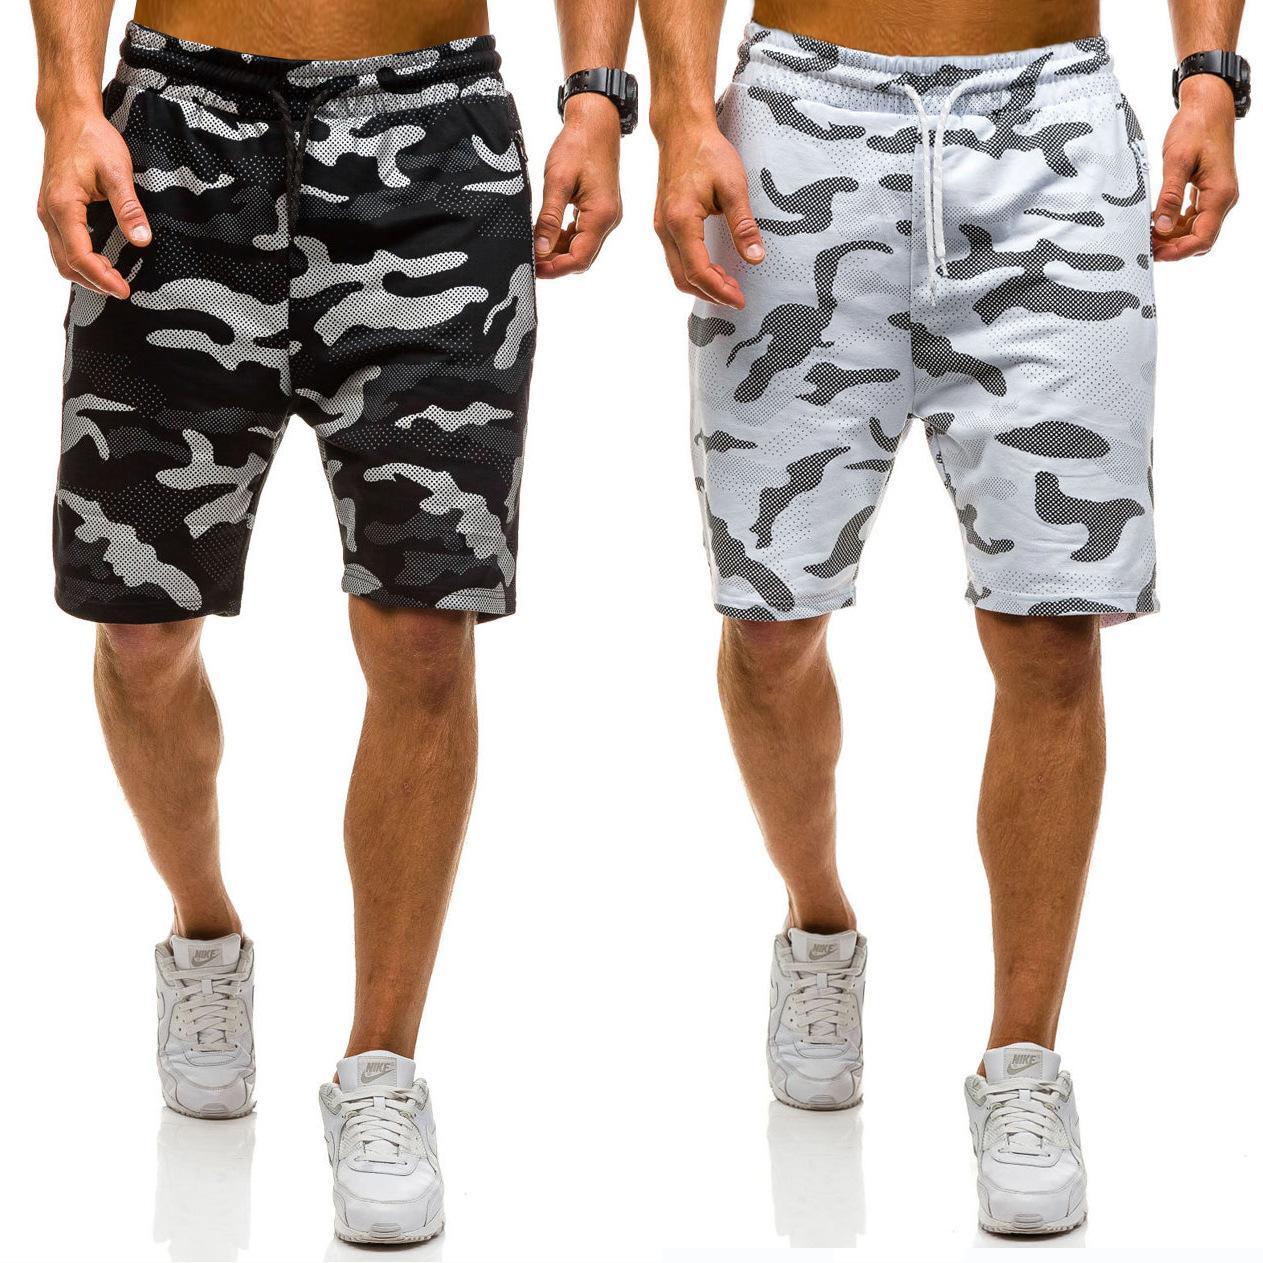 d12e85cd7e 2018 New Summer Camouflage Cargo Shorts Men Loose Men's Military ...